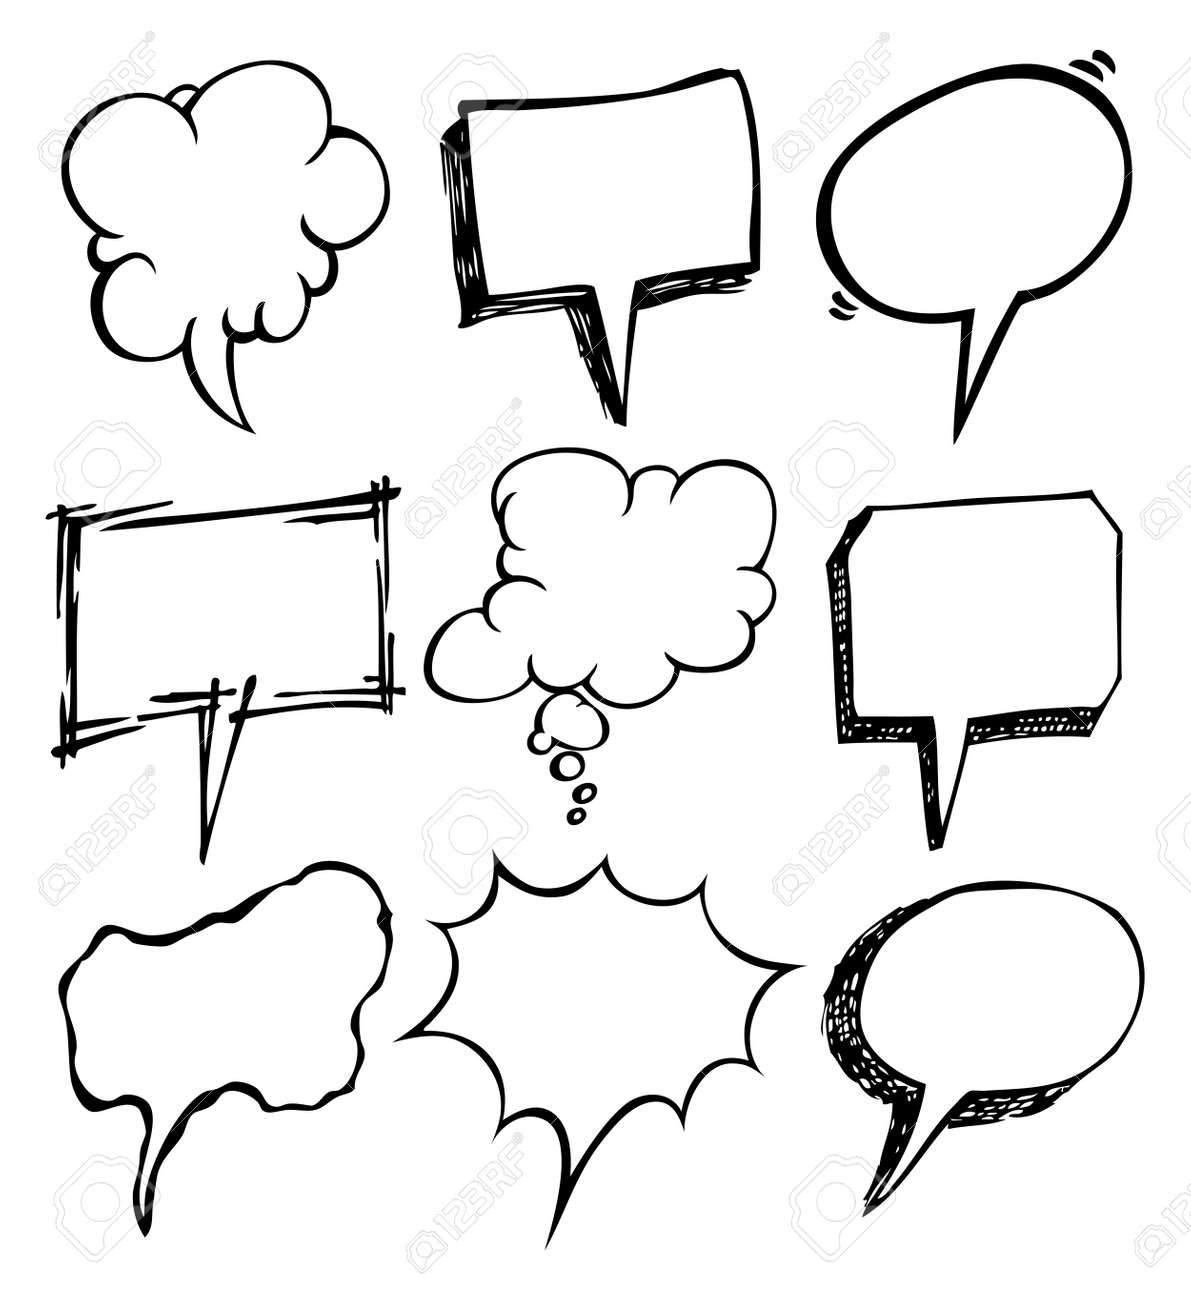 set of bubble speec doodle Stock Vector - 14100714